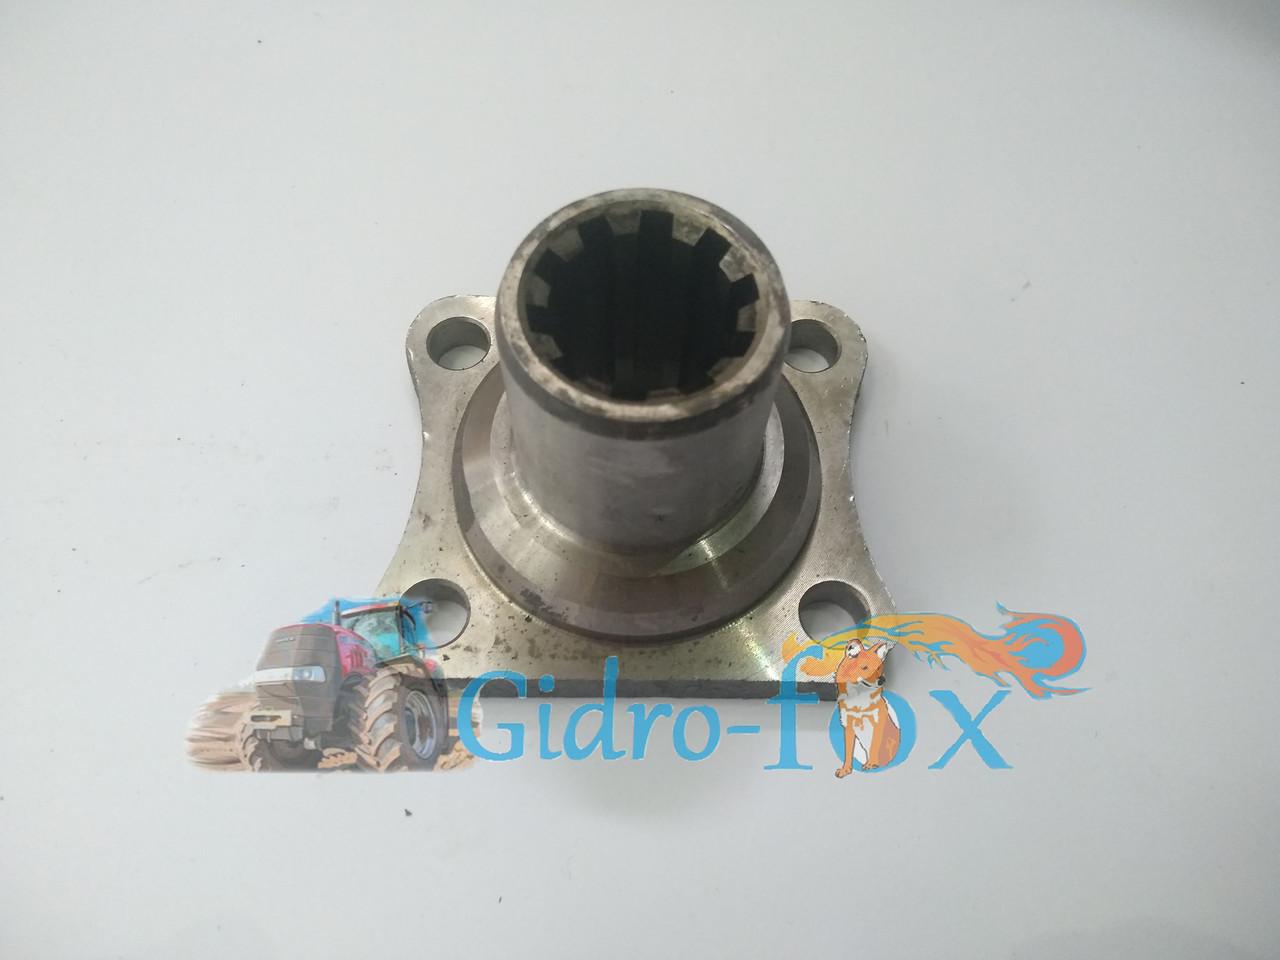 Фланец промежуточной опоры карданного вала ПВМ (МТЗ-82, Д-240) Кт.Н. 52-1802078